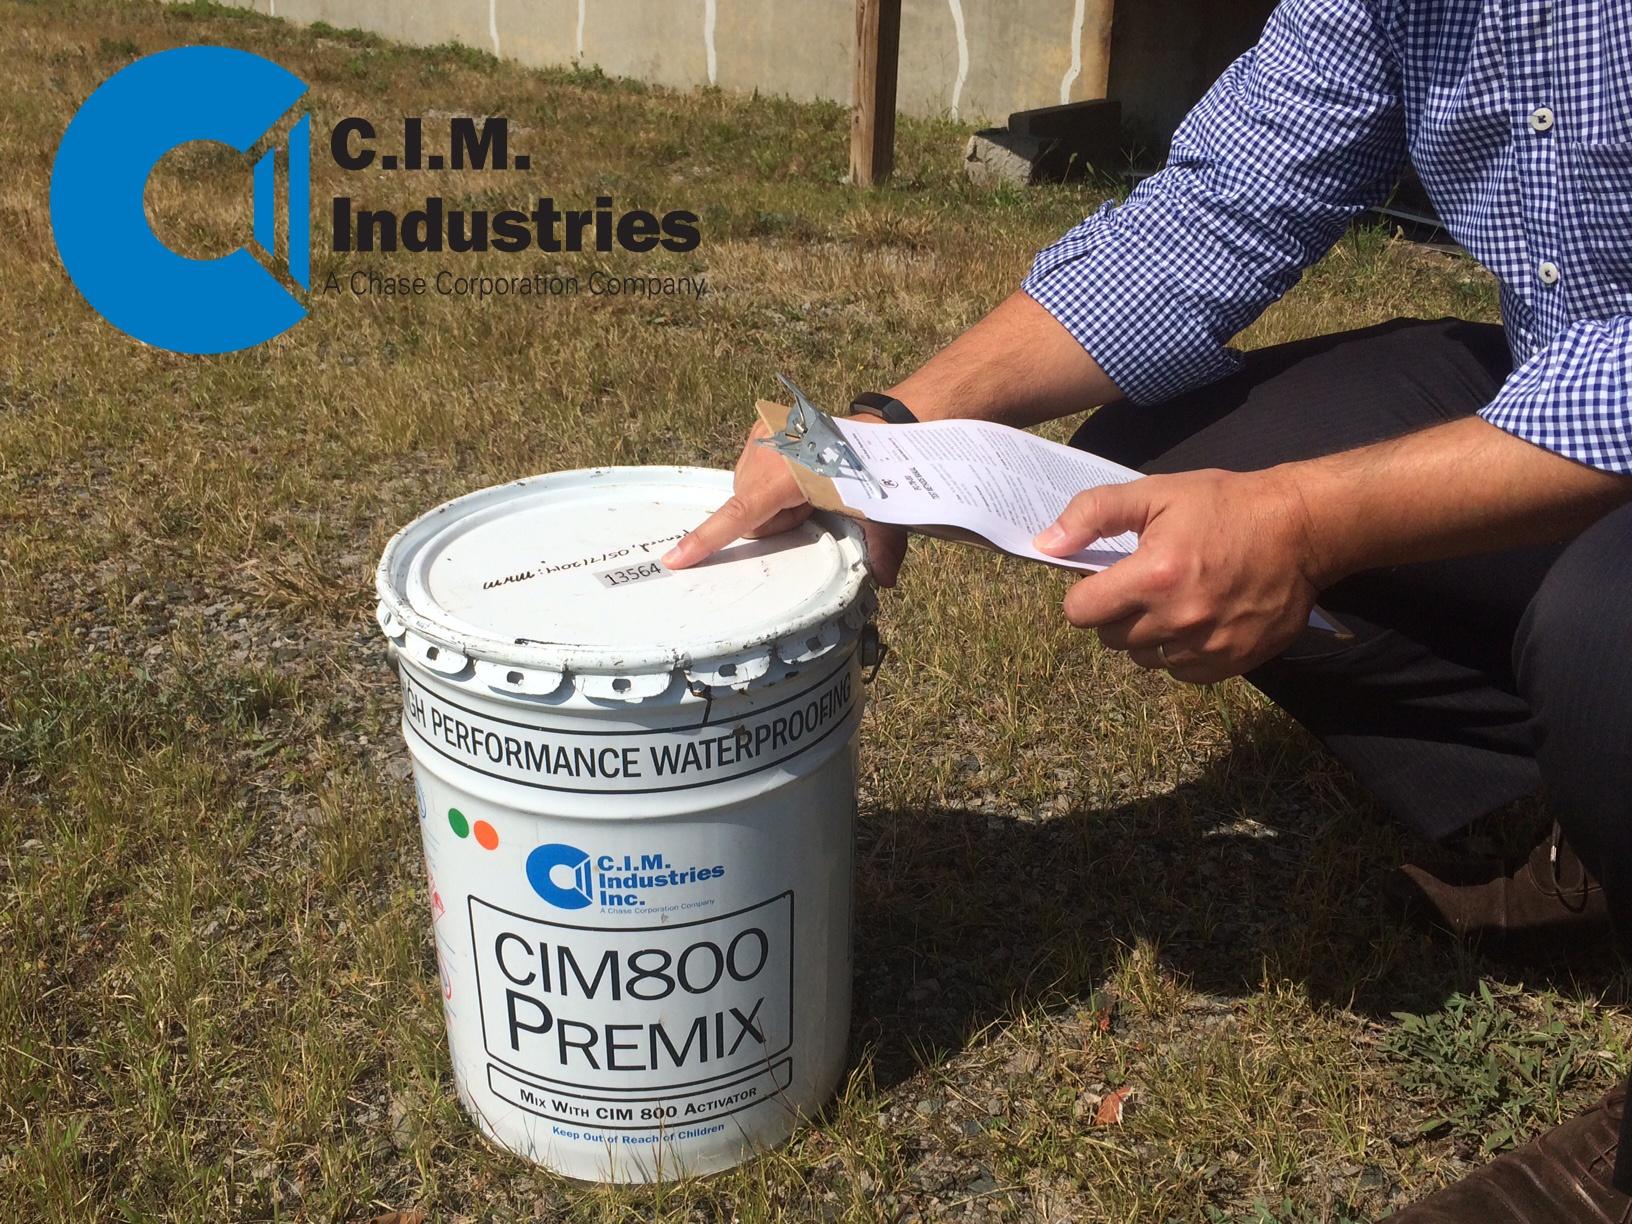 Contractor Verifying CIM Industries documentation